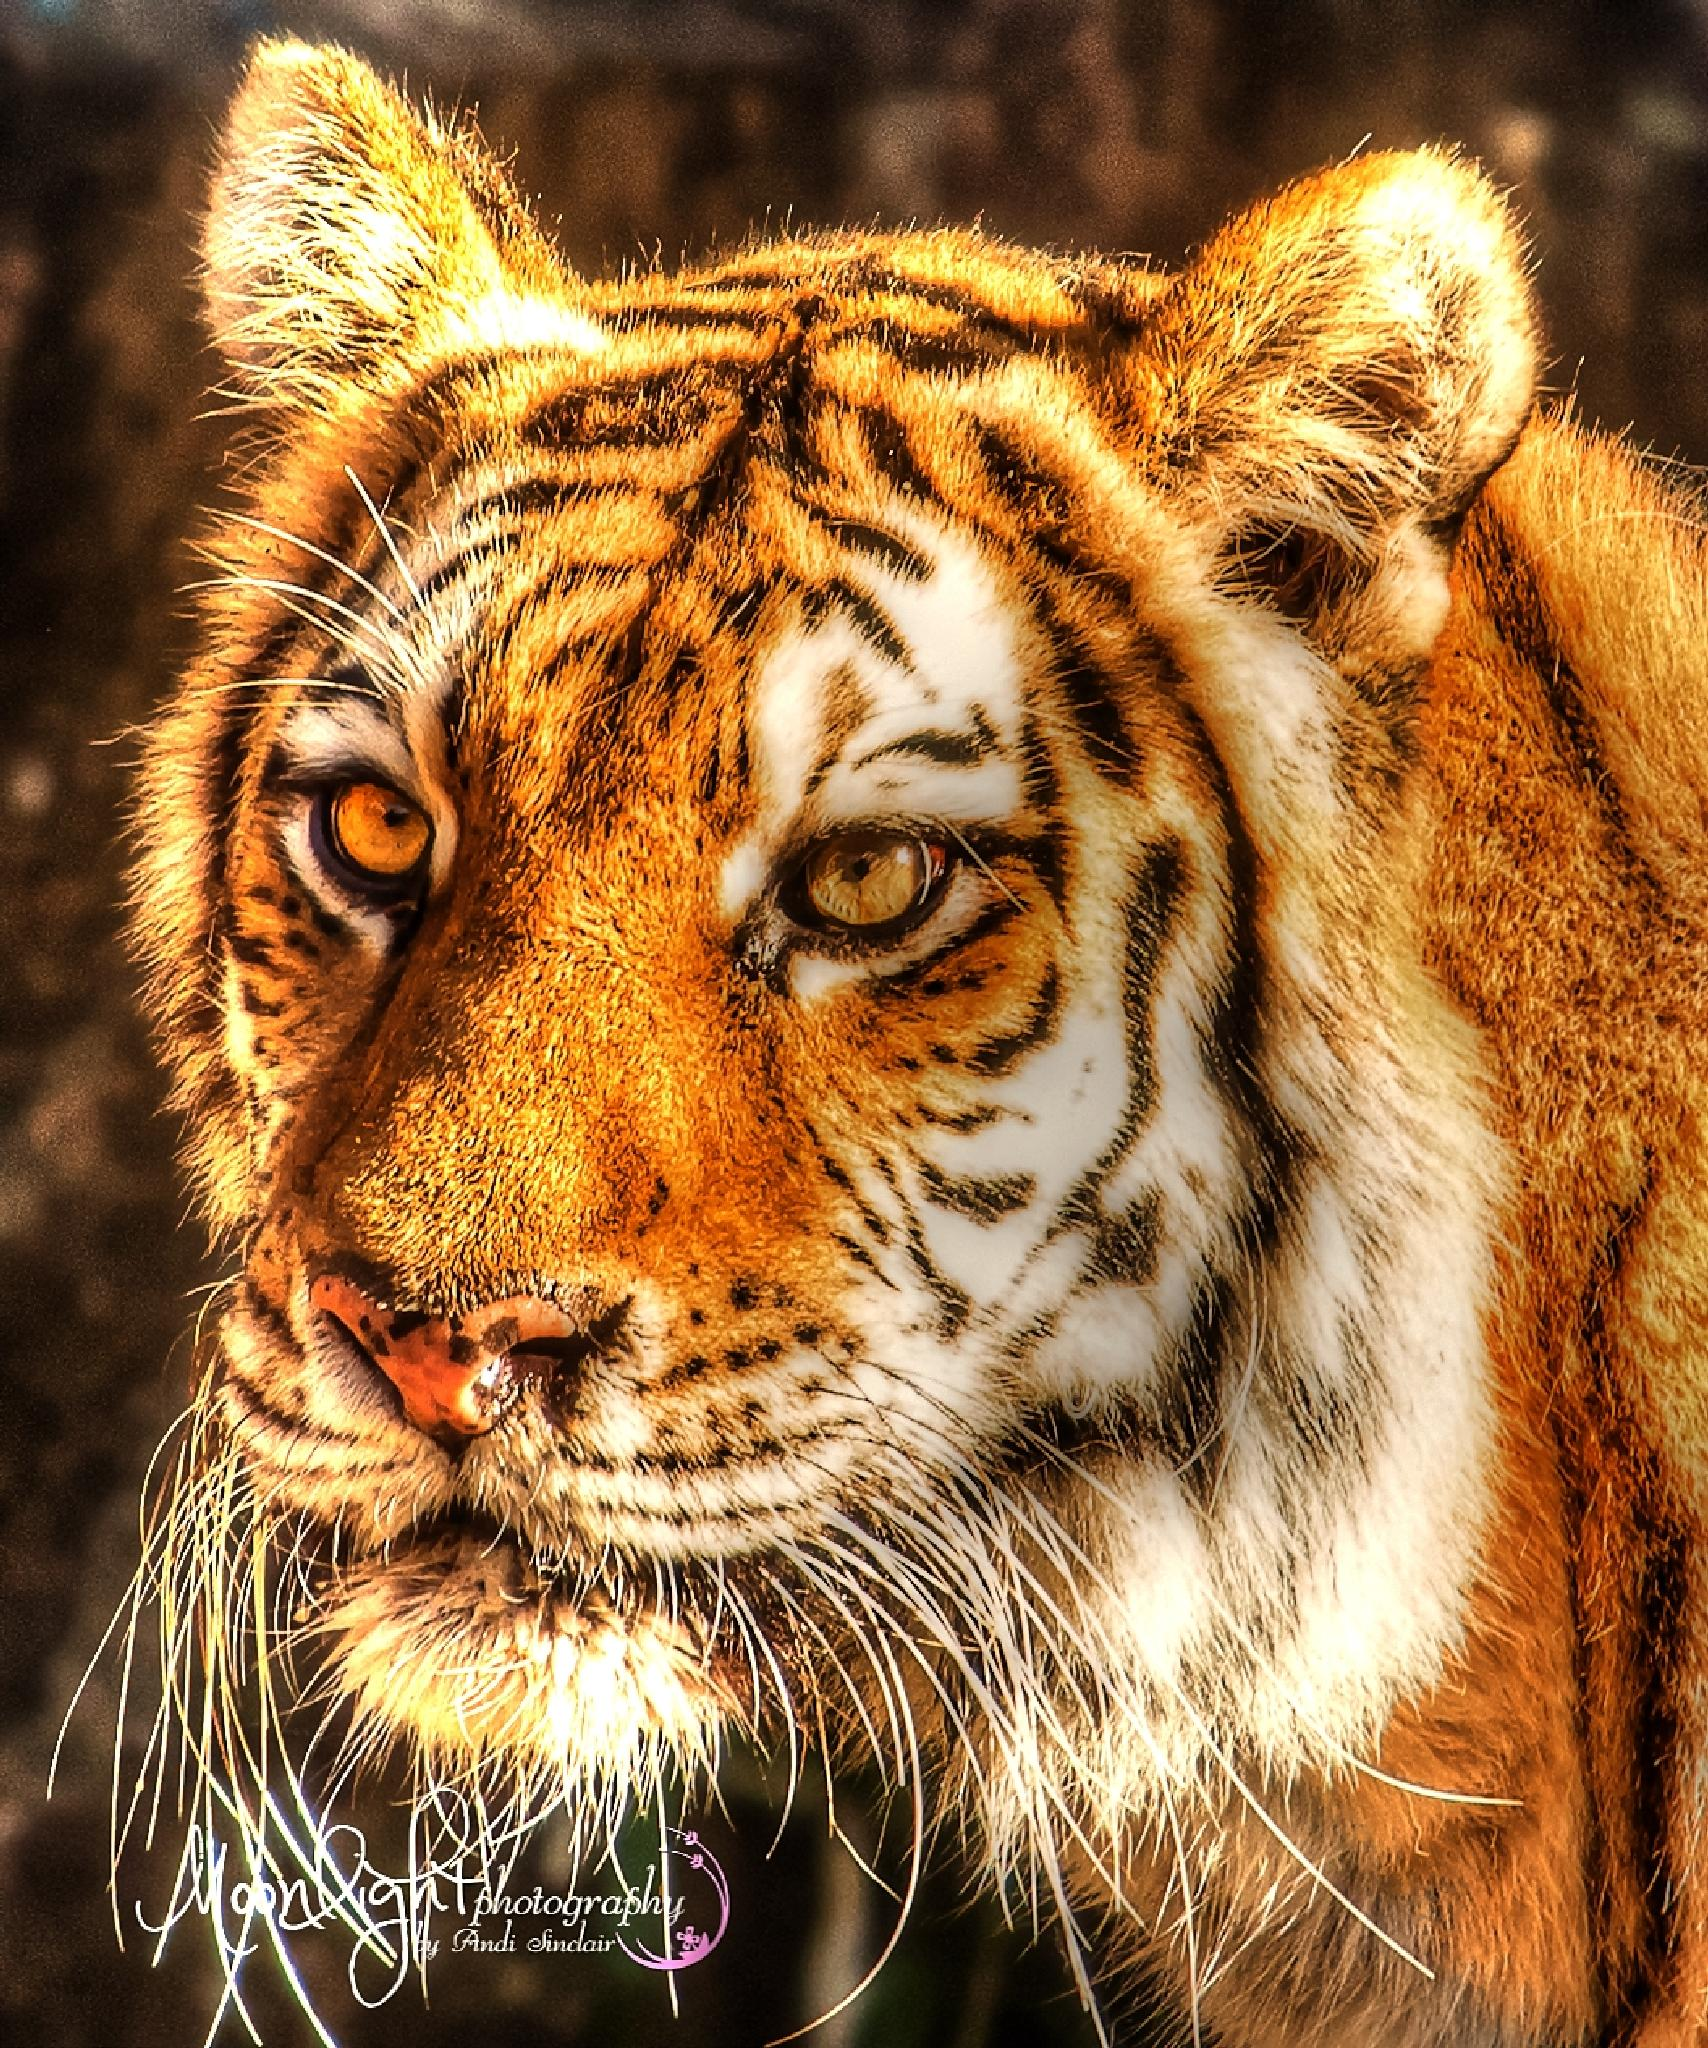 Tiger  River Banks Zoo  by Andi Sinclair